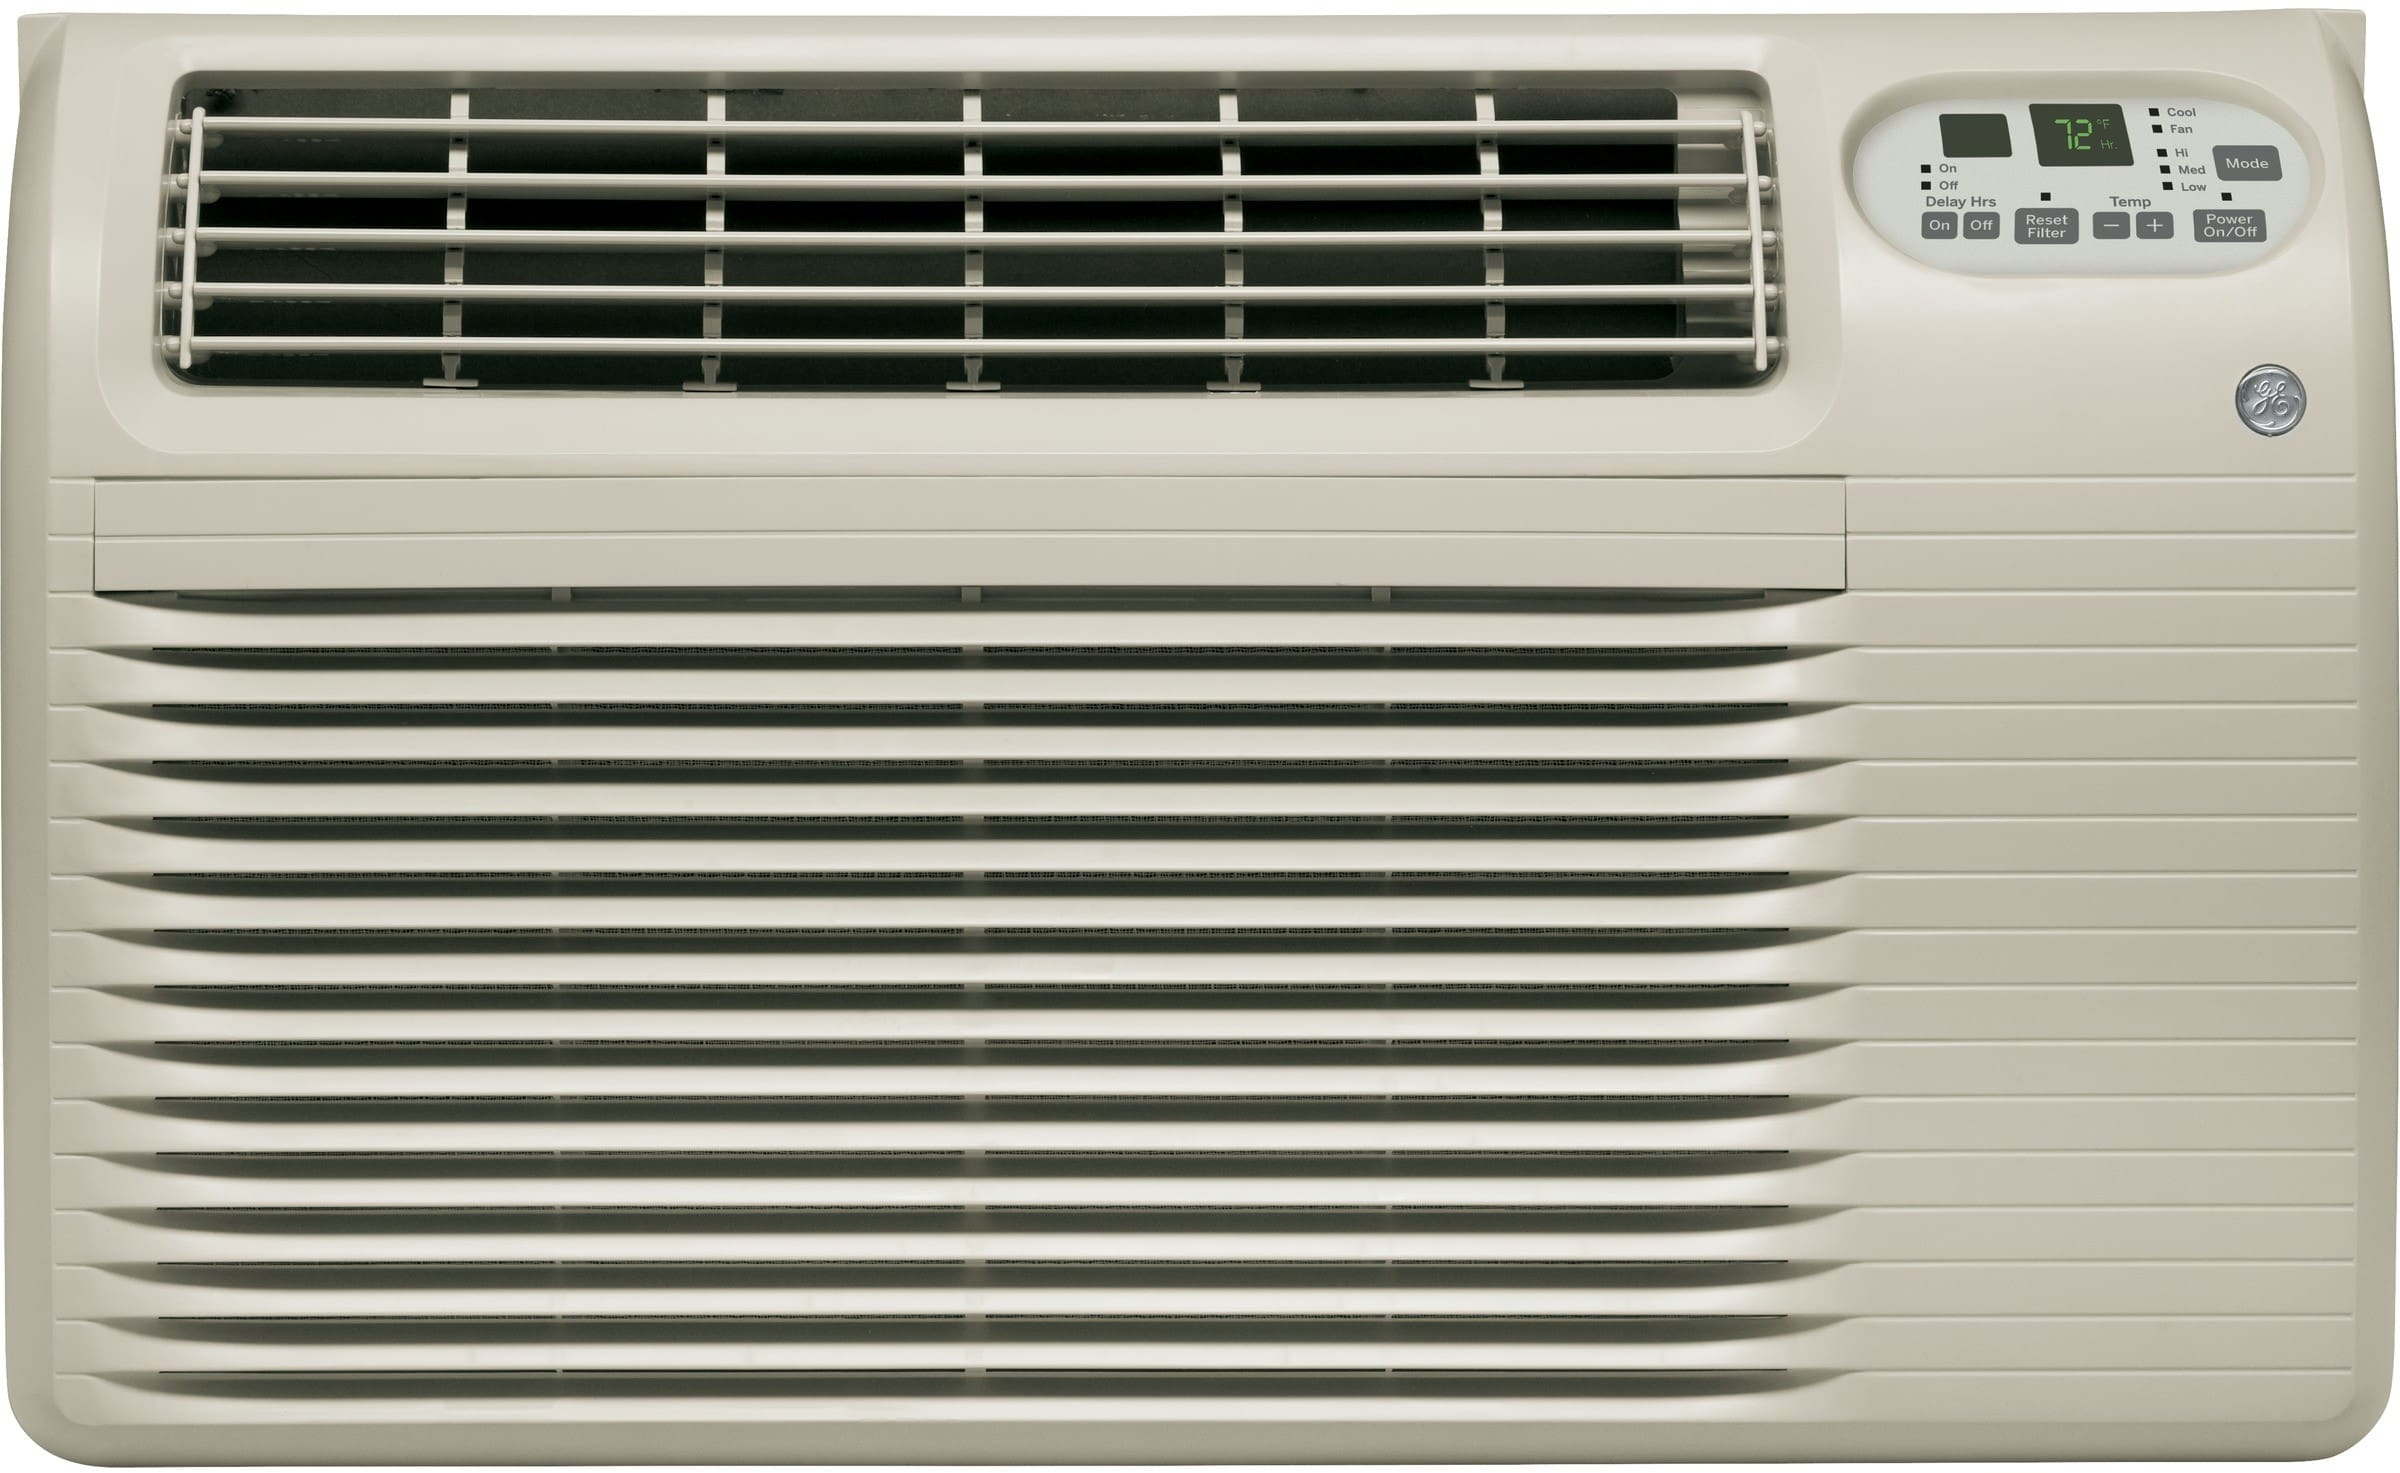 Ge Upright Freezer Manual Ge Ajcq10acg 10200 Btu Thru The Wall Air Conditioner With 107